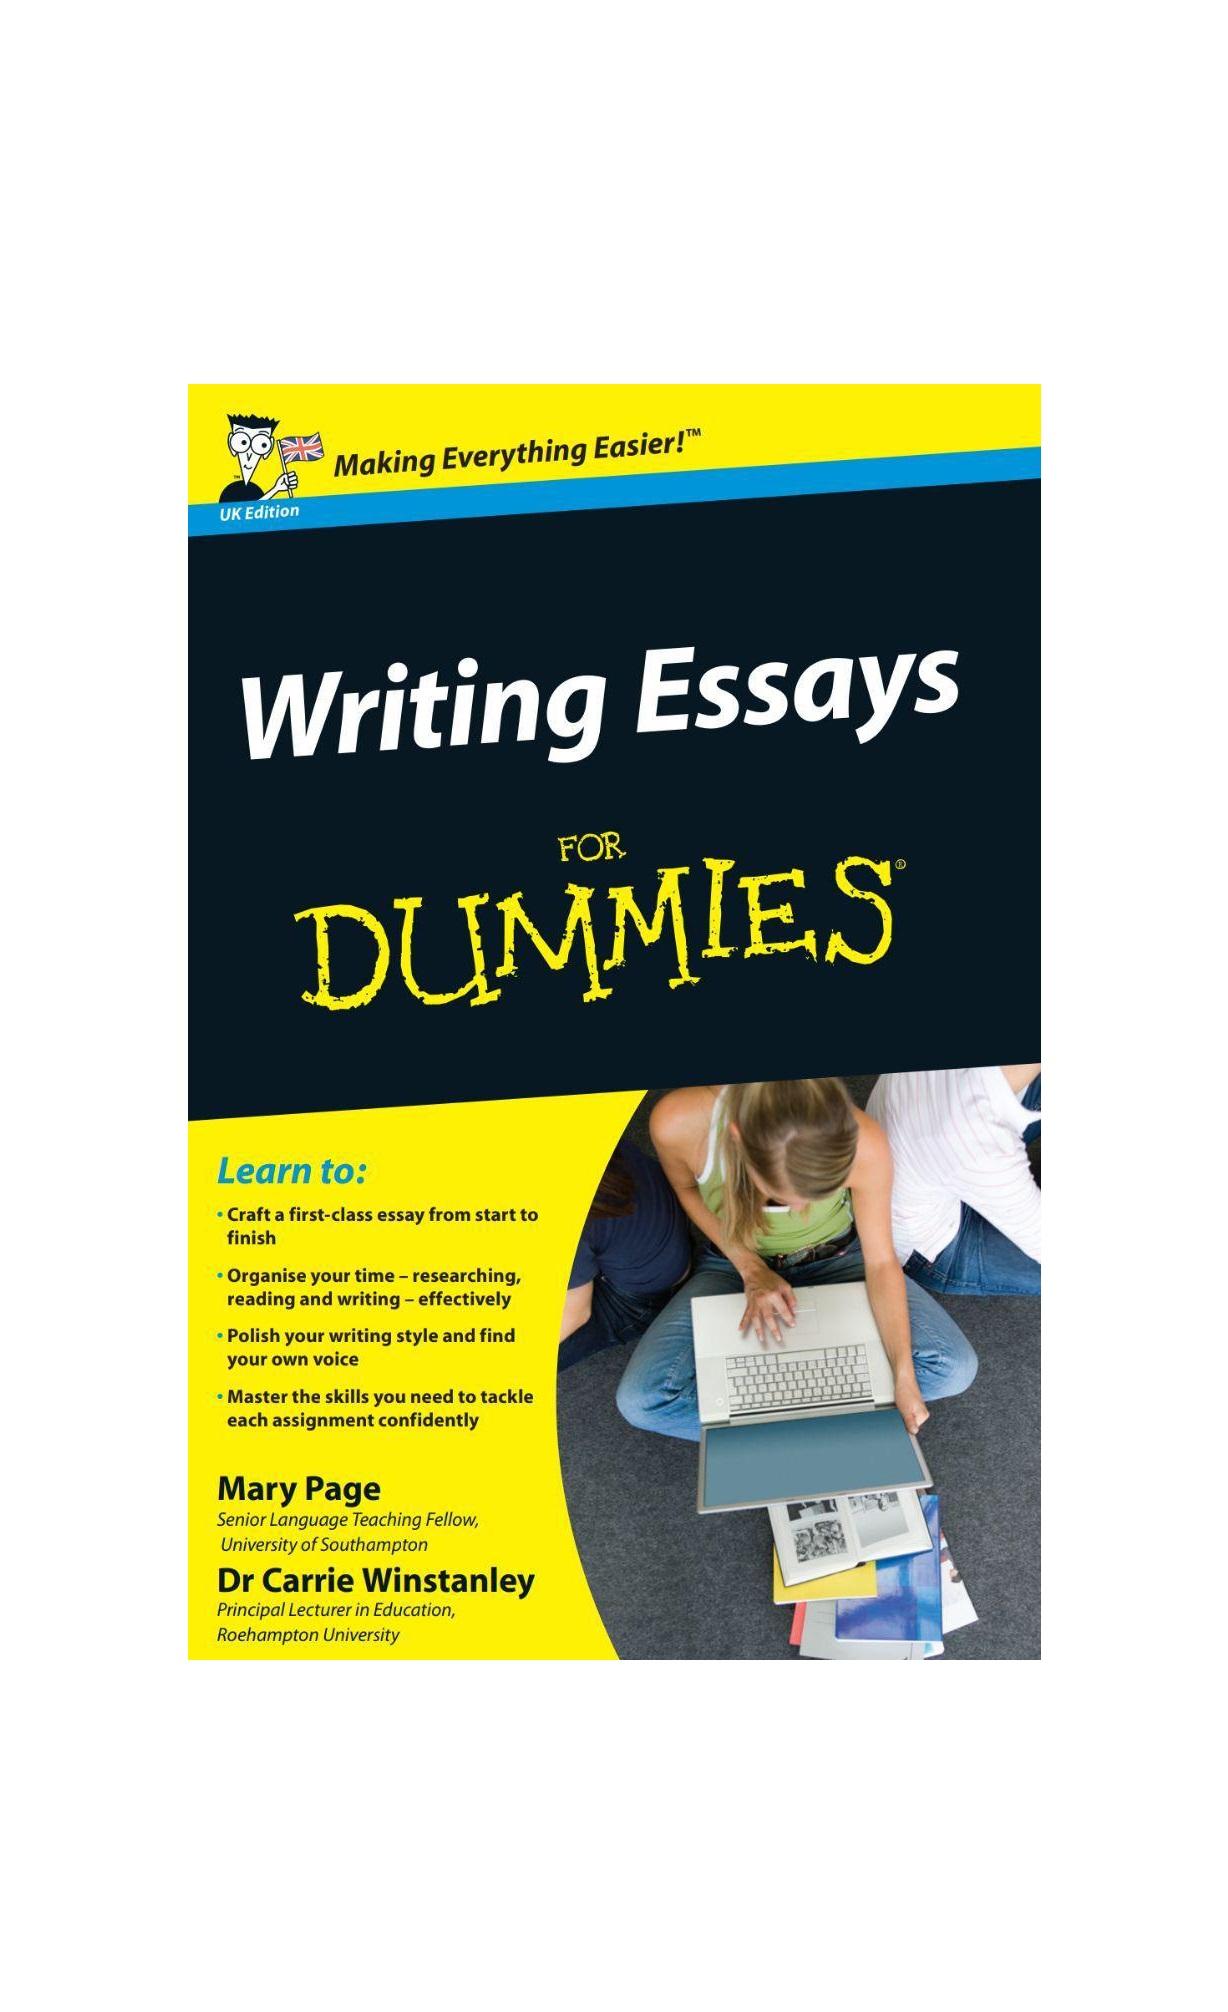 Essay writting for dummies